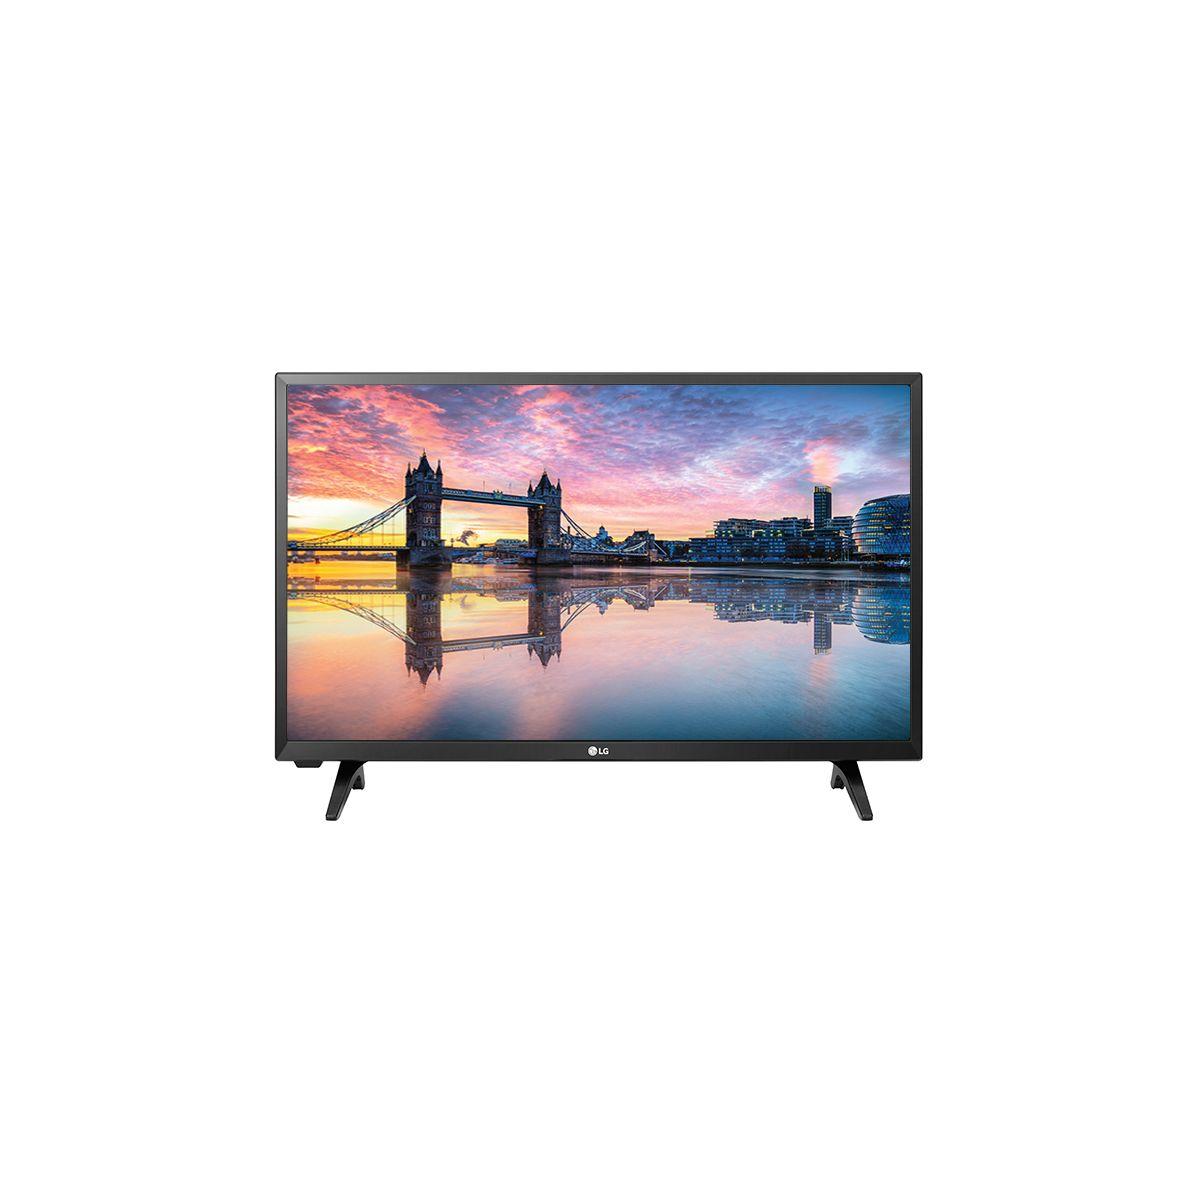 TV LG 28MT42VF